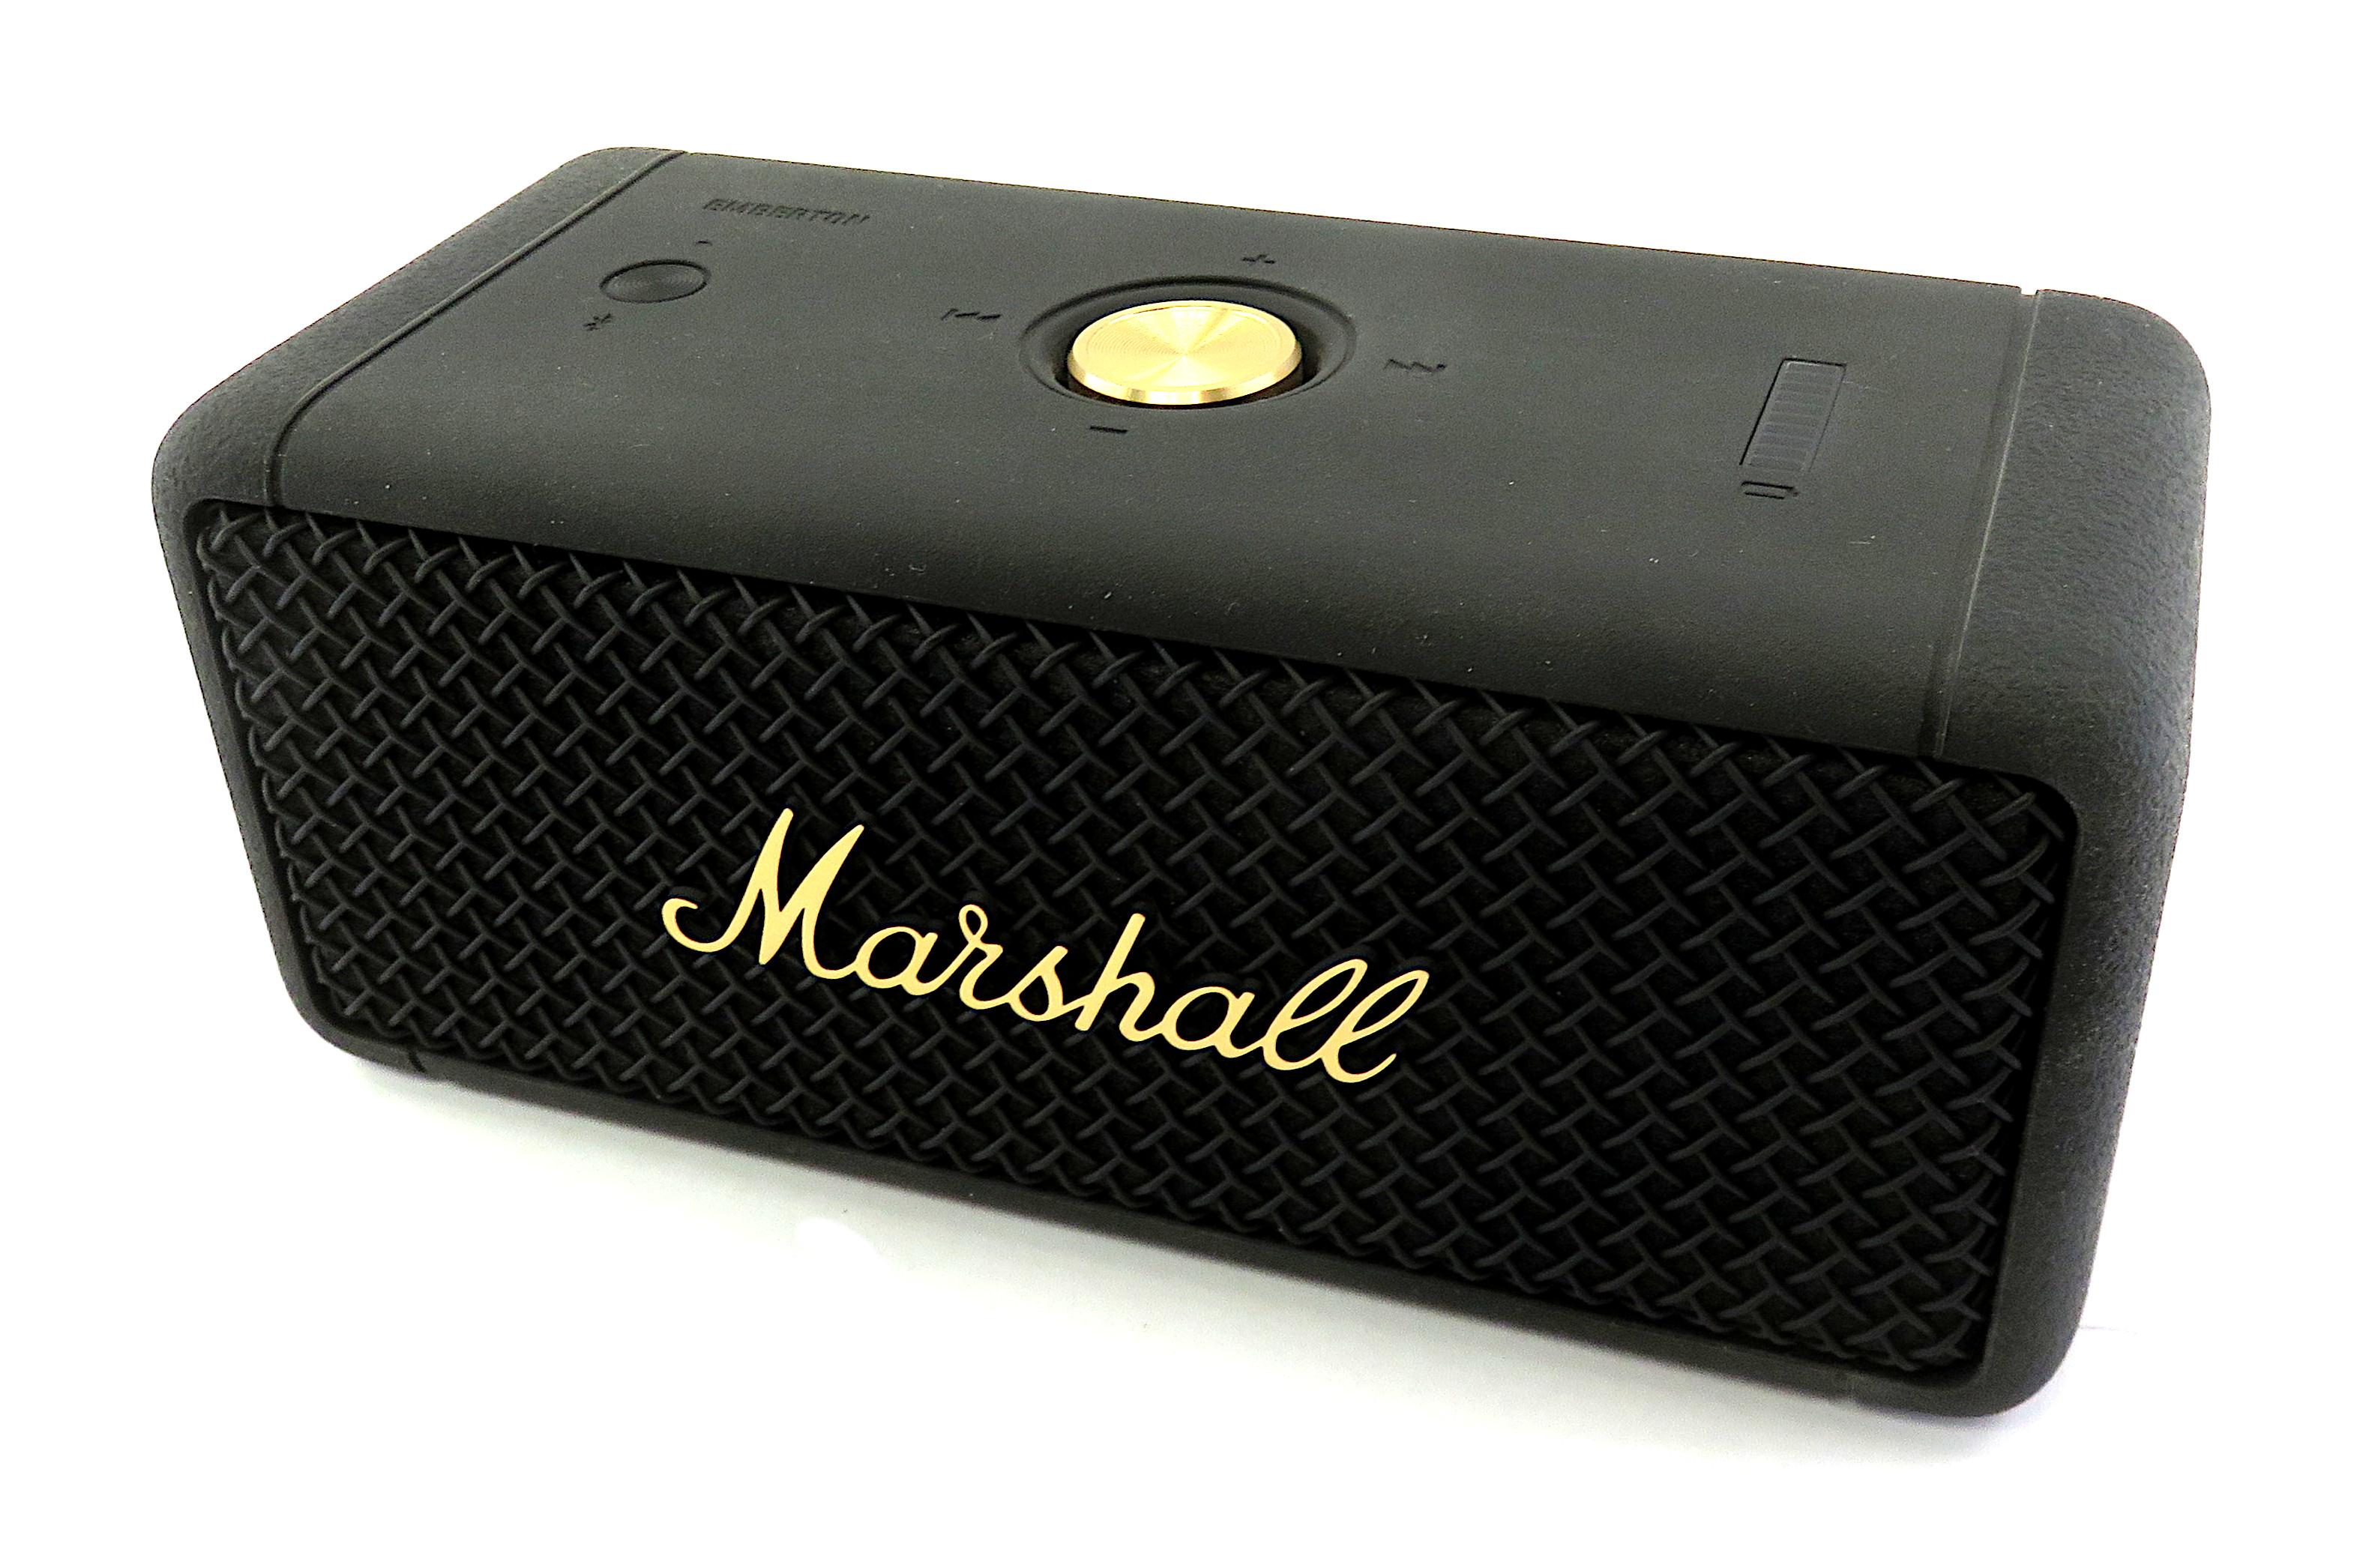 Marshall Emberton Rugged Portable Bluetooth Speaker: Black & Brass, Boxed